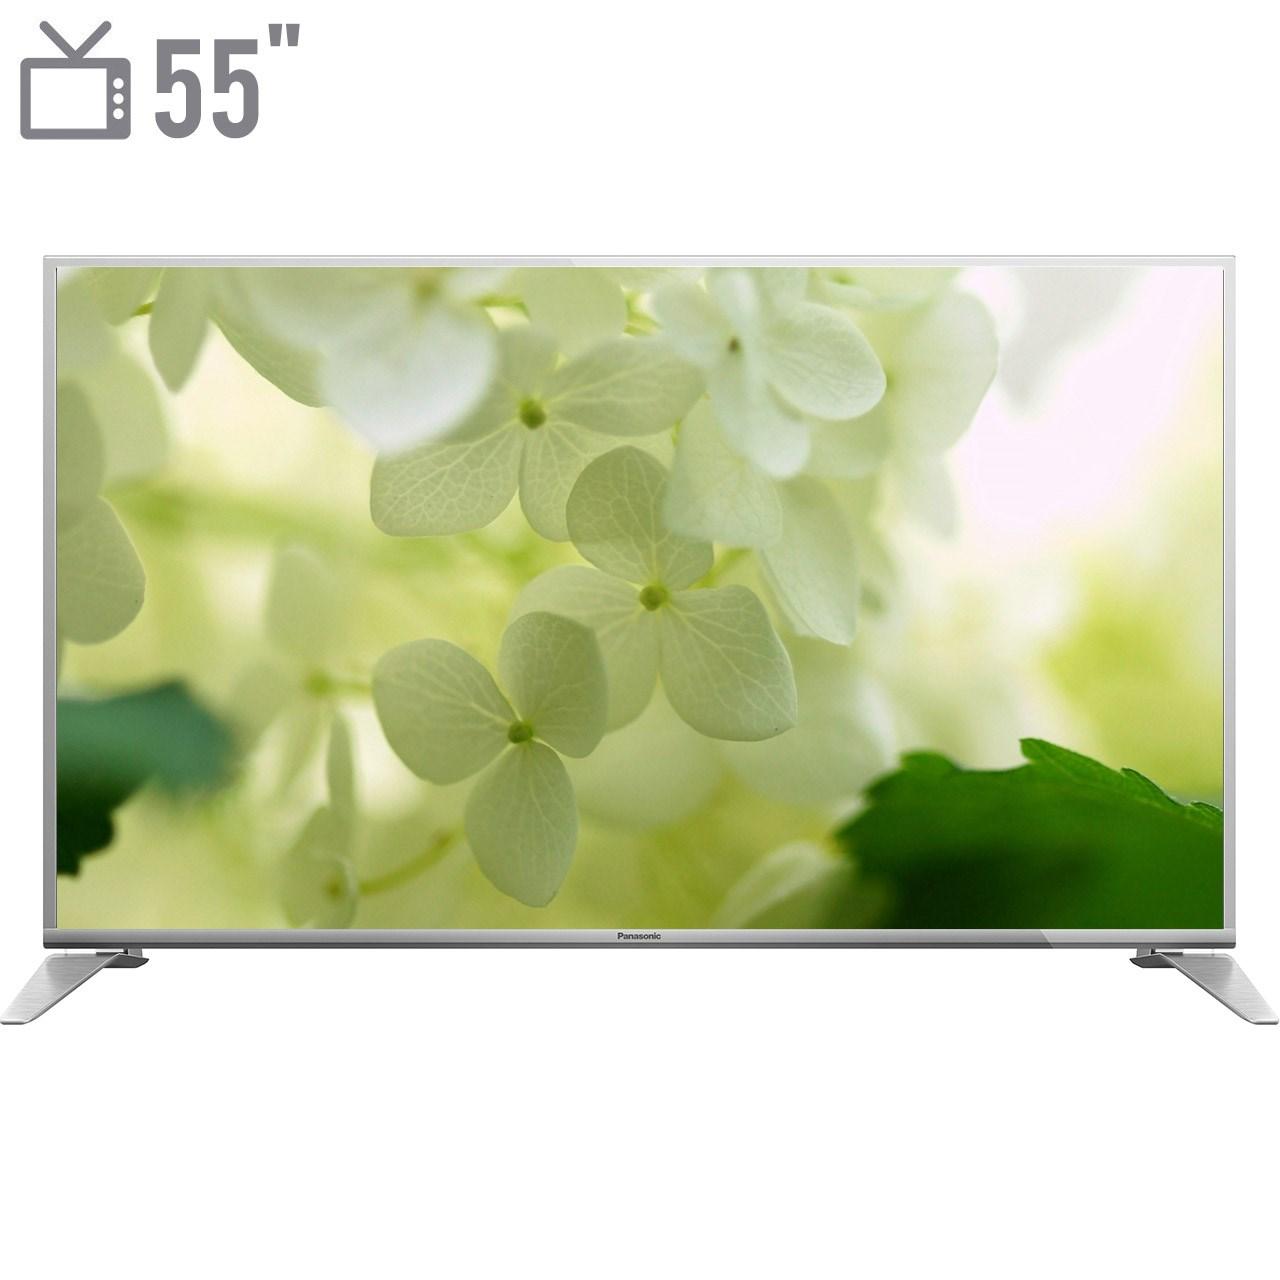 تلویزیون ال ای دی هوشمند پاناسونیک مدل 55DS630R سایز 55 اینچ